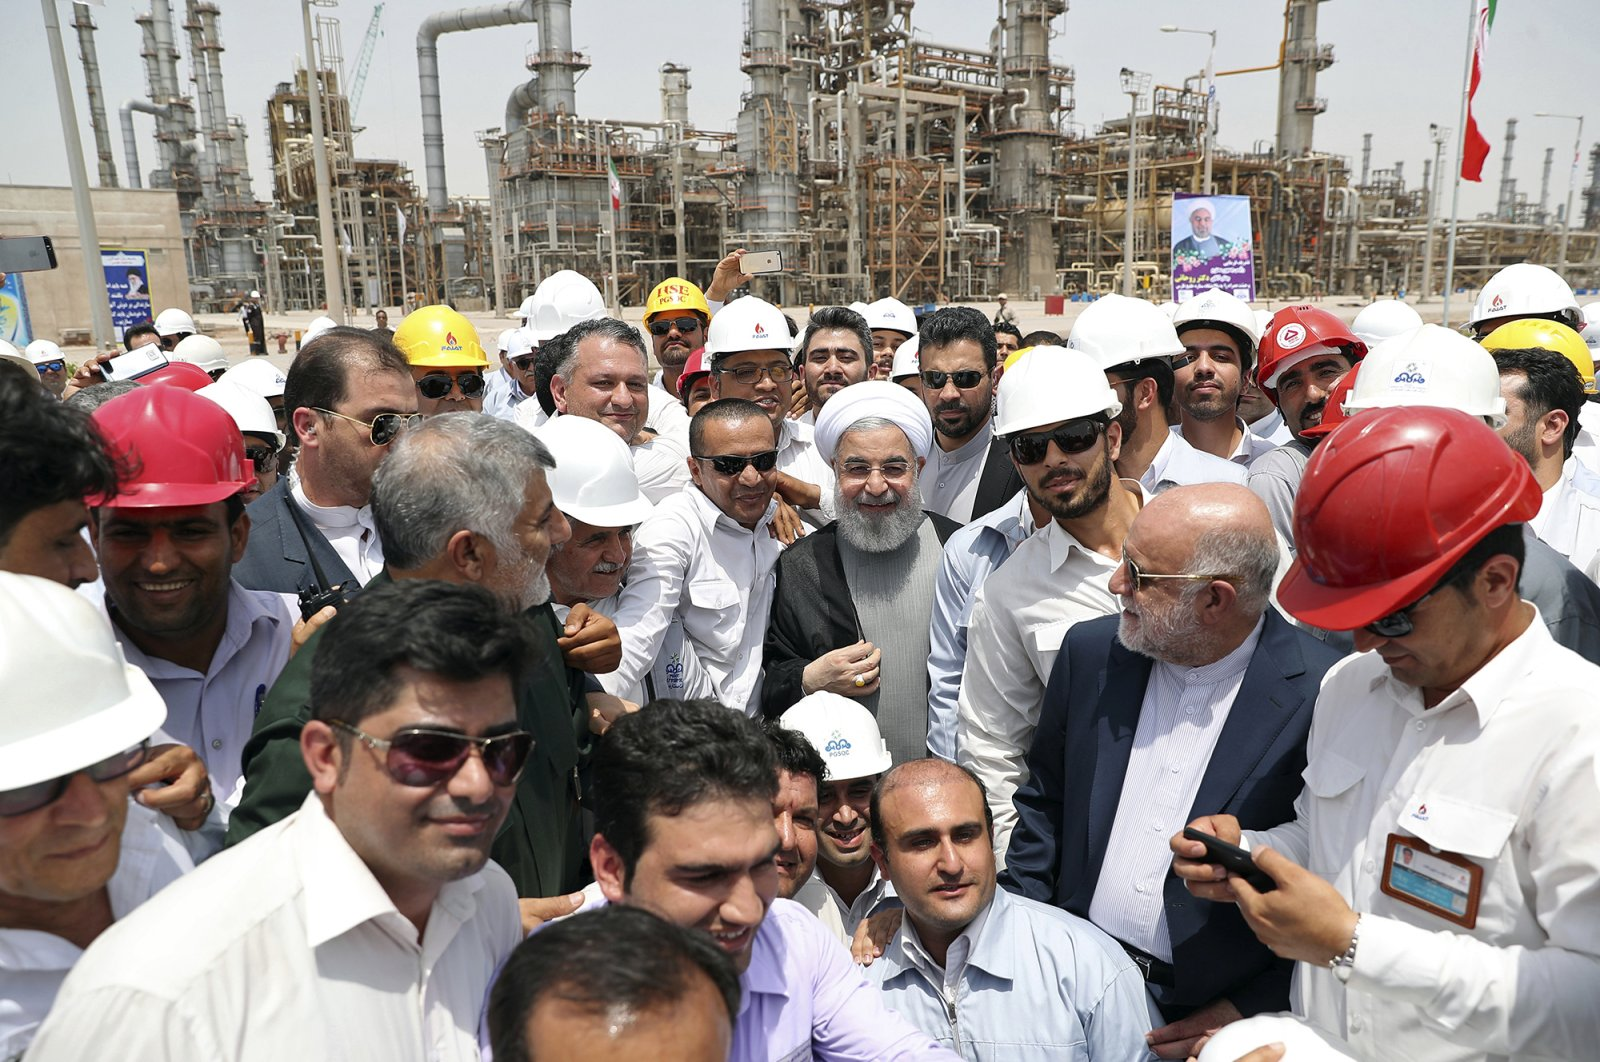 Iranian President Hassan Rouhani (C) inaugurates the Persian Gulf Star Refinery in Bandar Abbas, Iran, April 30, 2017. (Iranian Presidency Office via AP Photo)